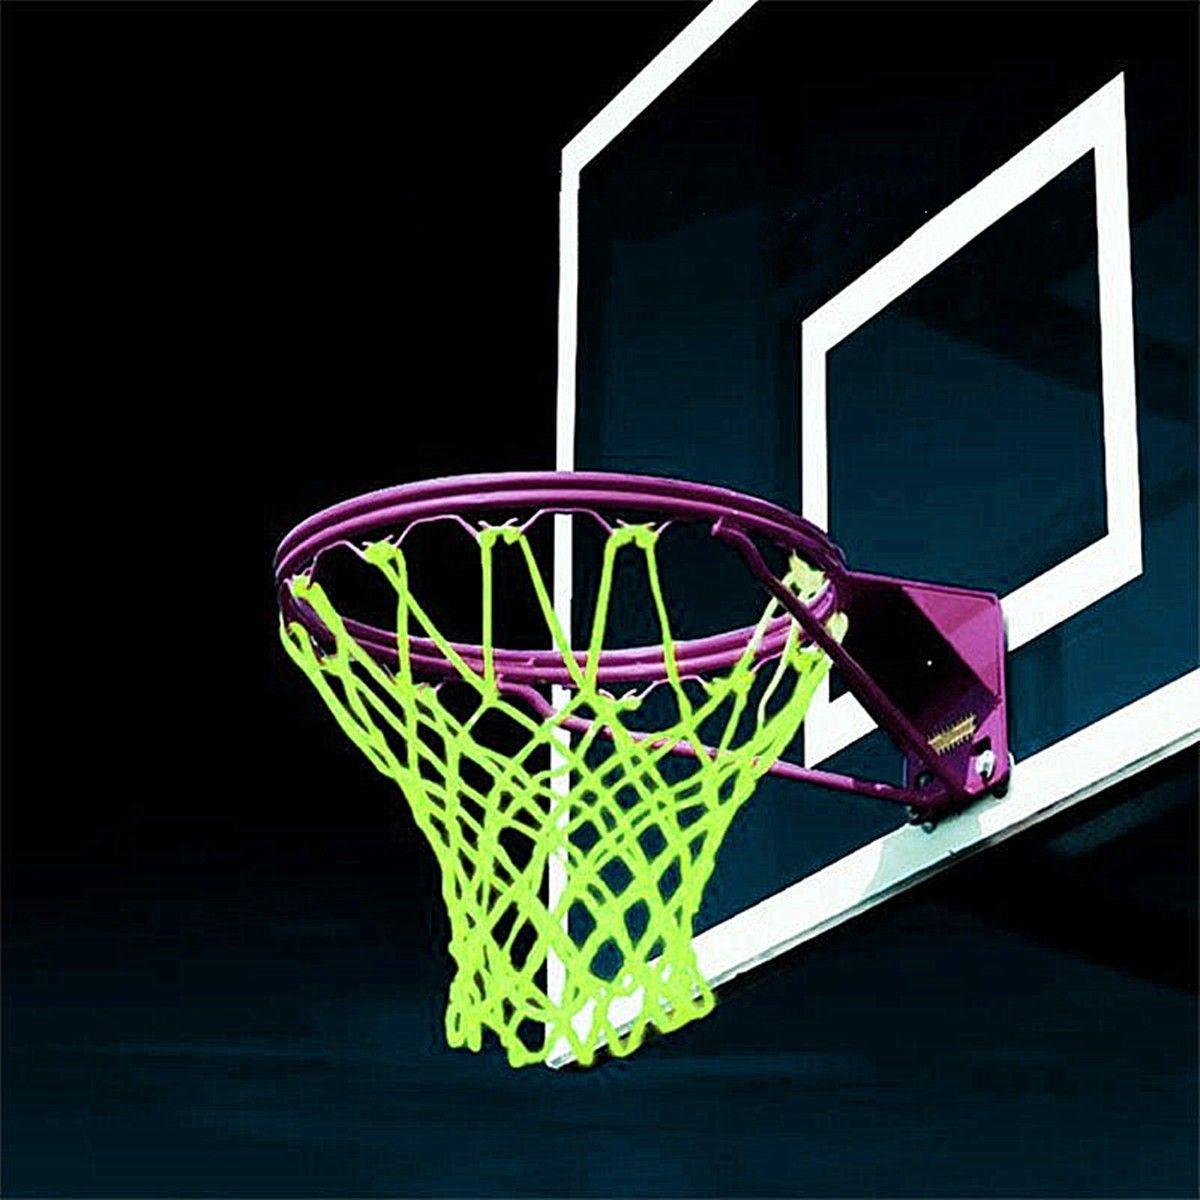 9ed48354 2019 New Glowing Light Shooting Training Fluorescent Green Basketball Net  Backboard Rim Ball Mesh Nylon Standard Basketball Hoop Net From Walon123,  ...